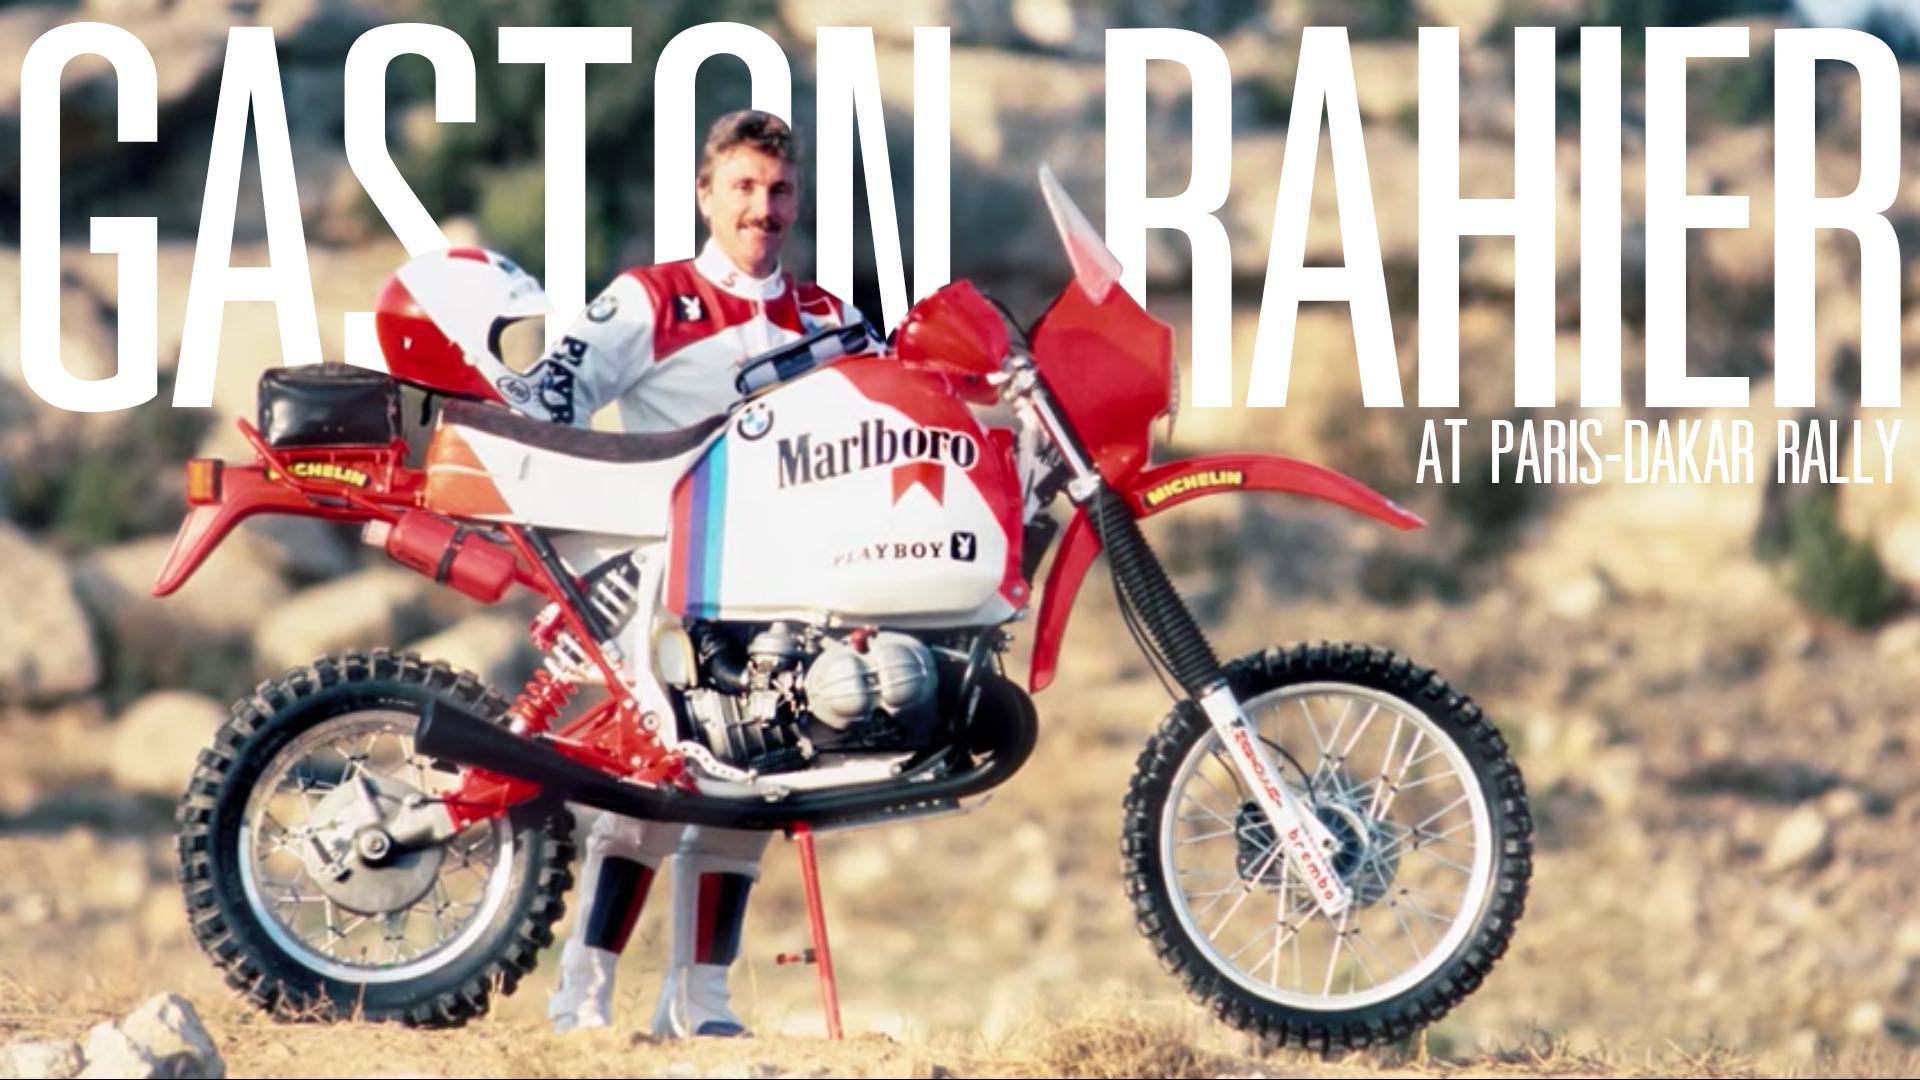 BMW R 80 G/S Gaston Rahier Paris-Dakar Rally